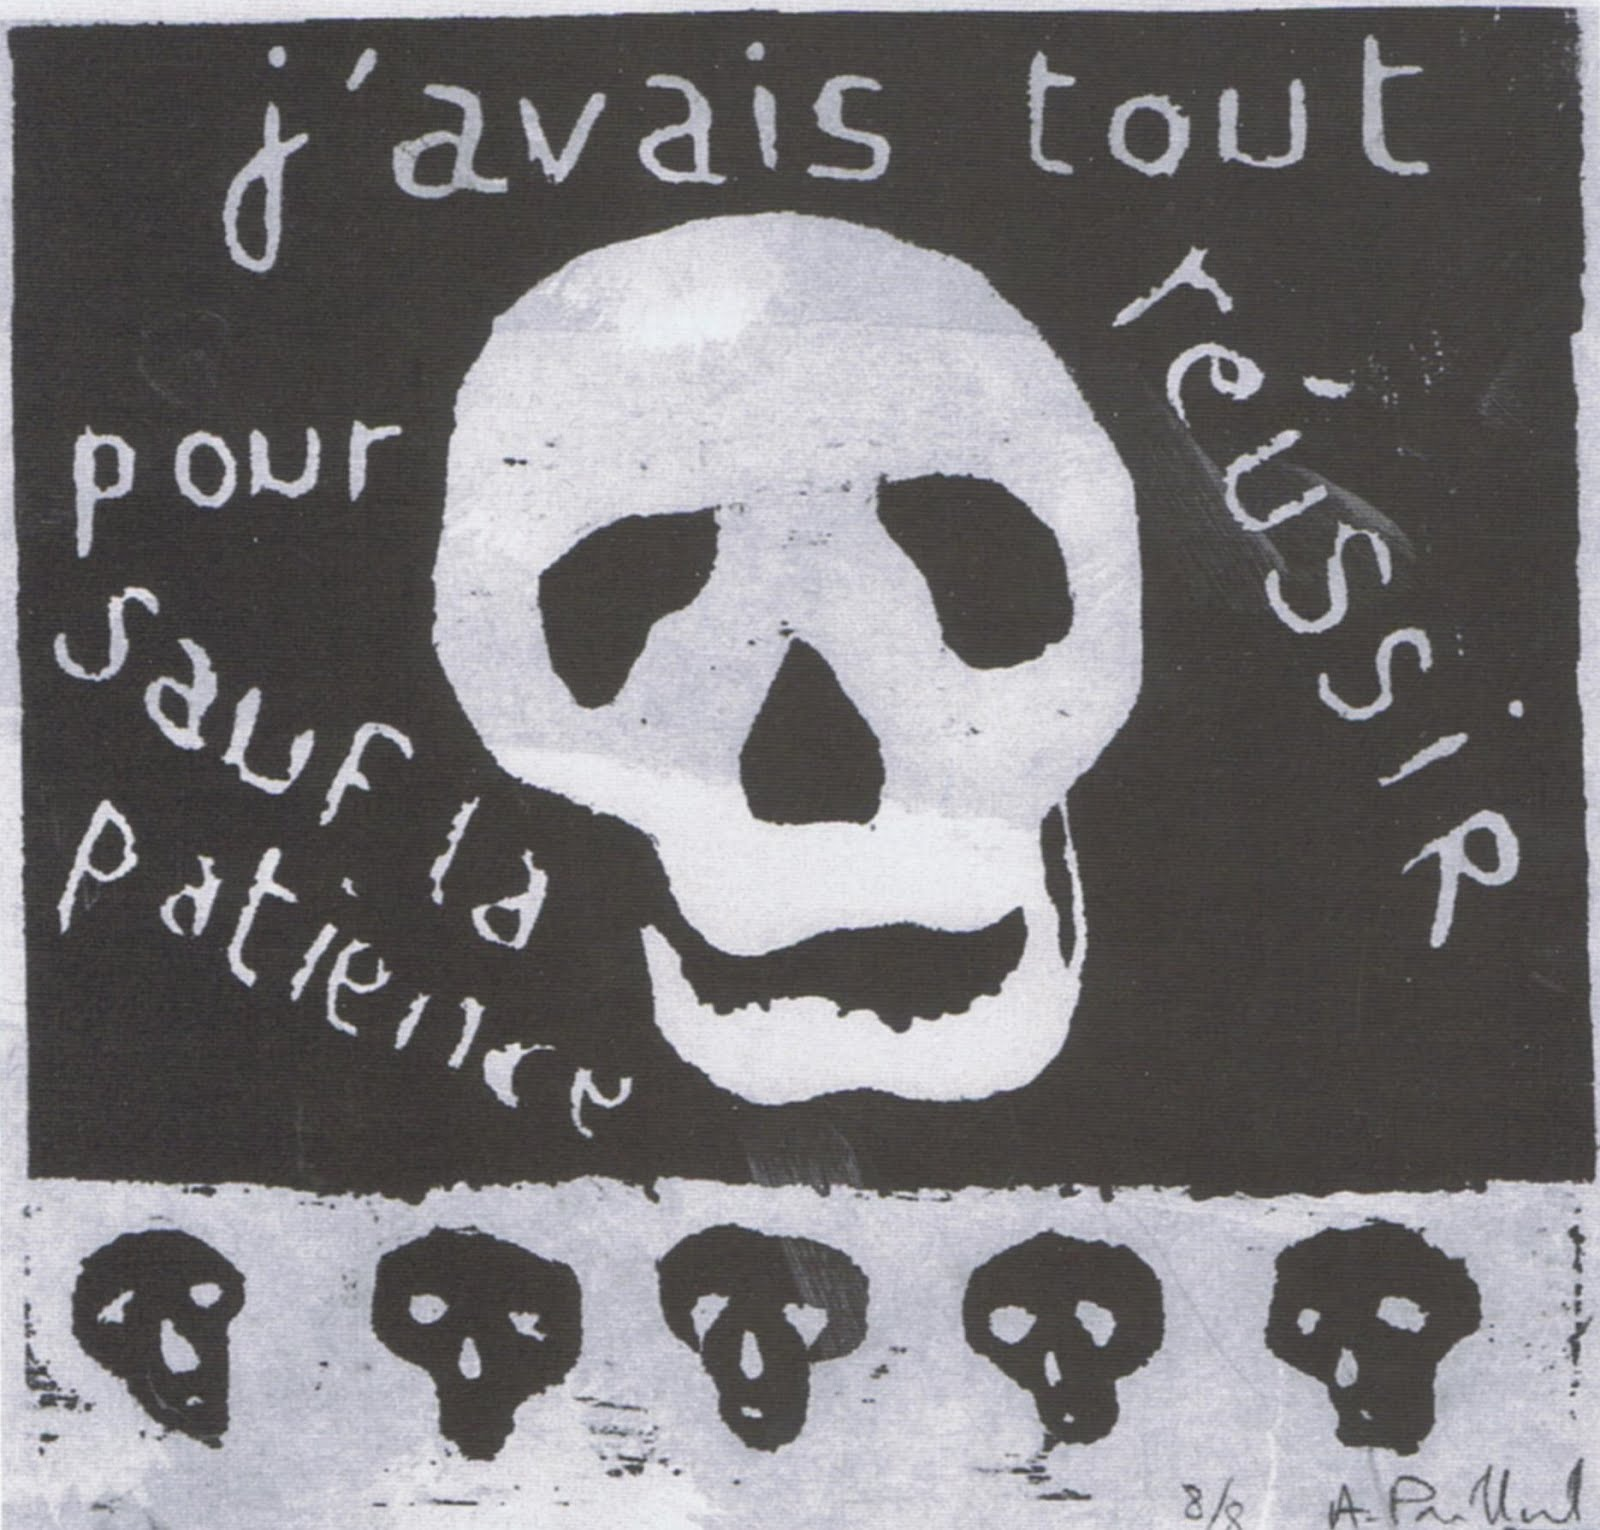 Alain PRILLARD EN SA DEMEURE, Texte inédit de Joël GAYRAUD